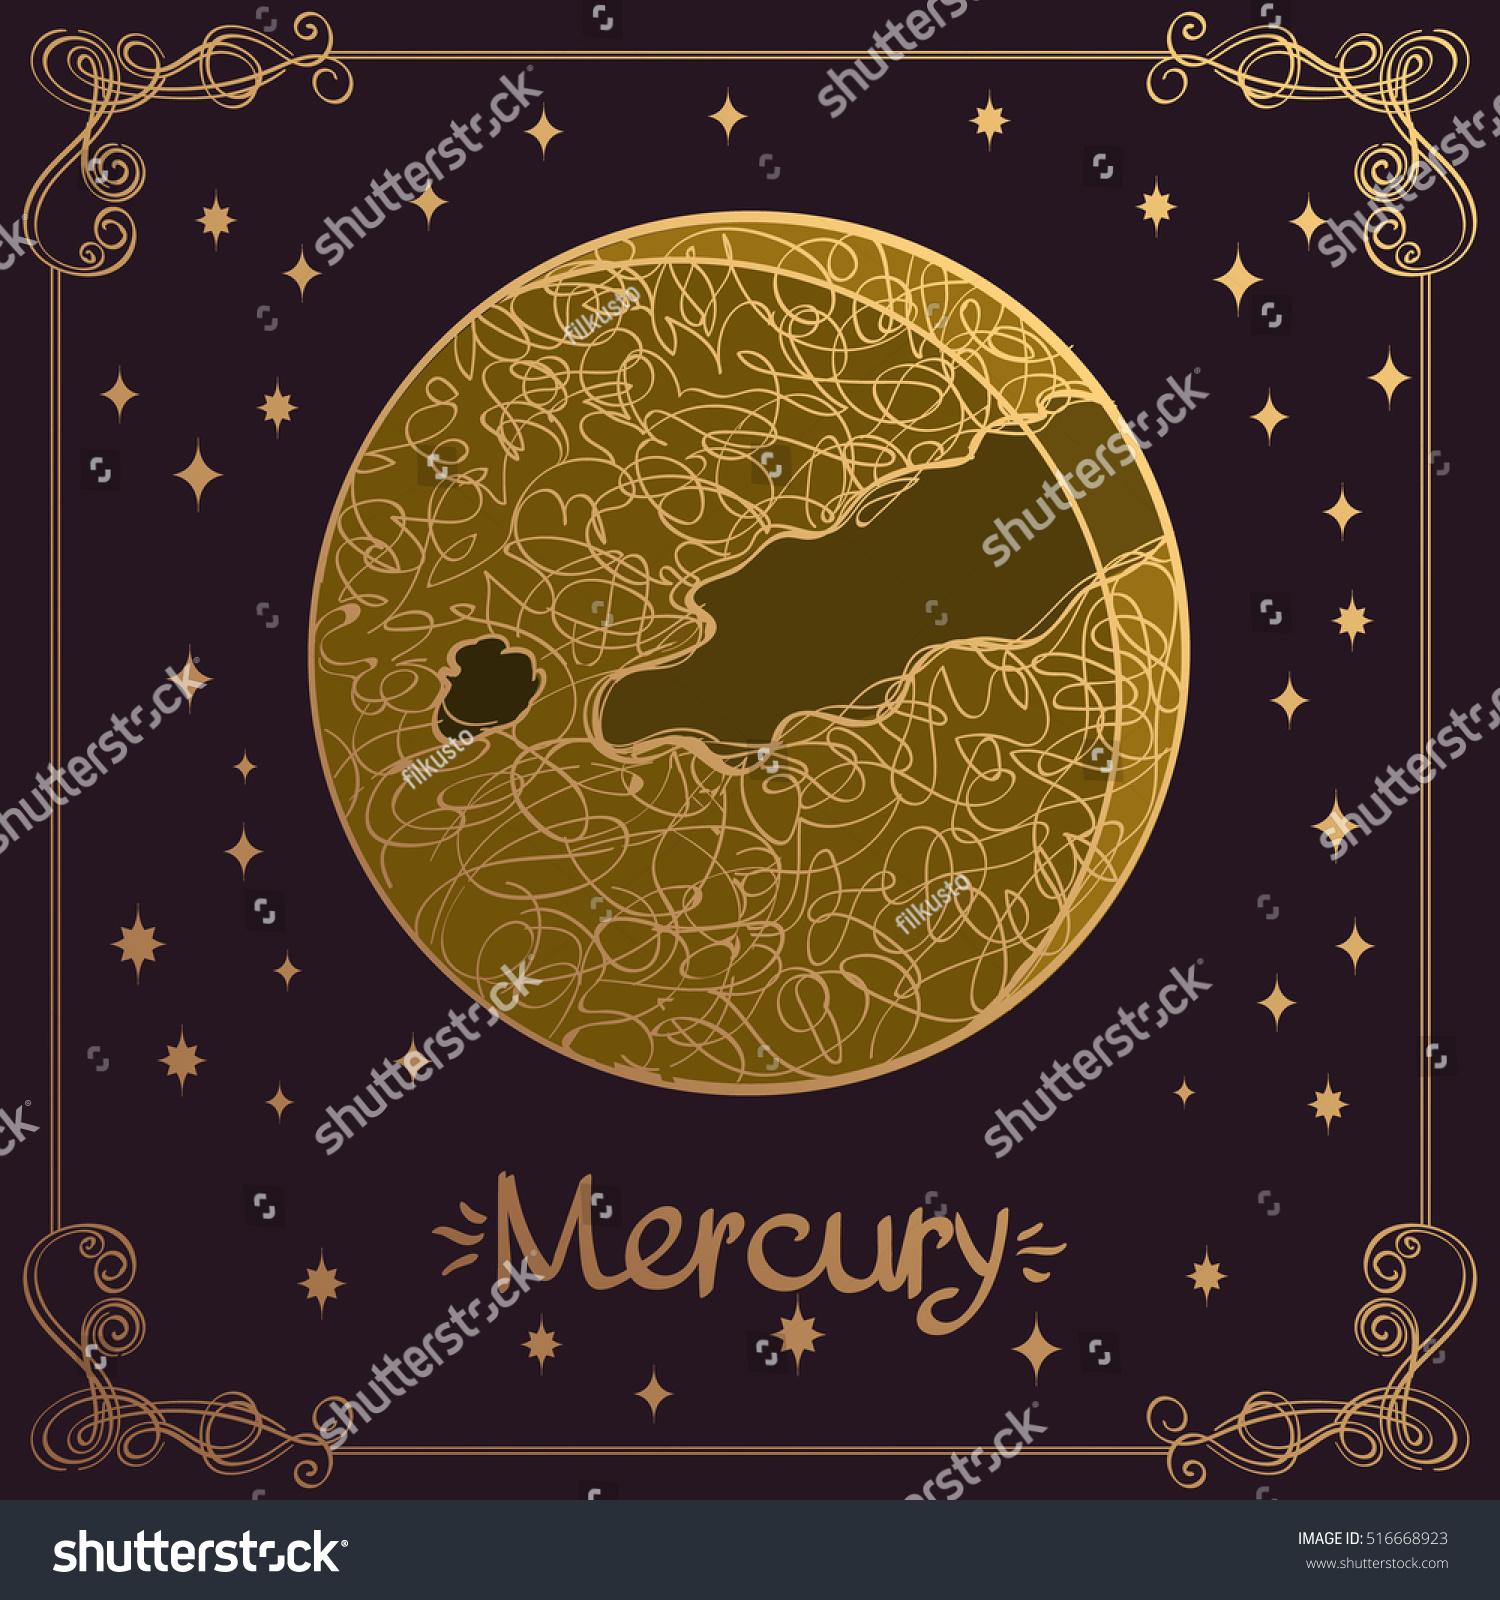 Mercury Stylized Illustration Mercury Hand Drawing Stock Vector